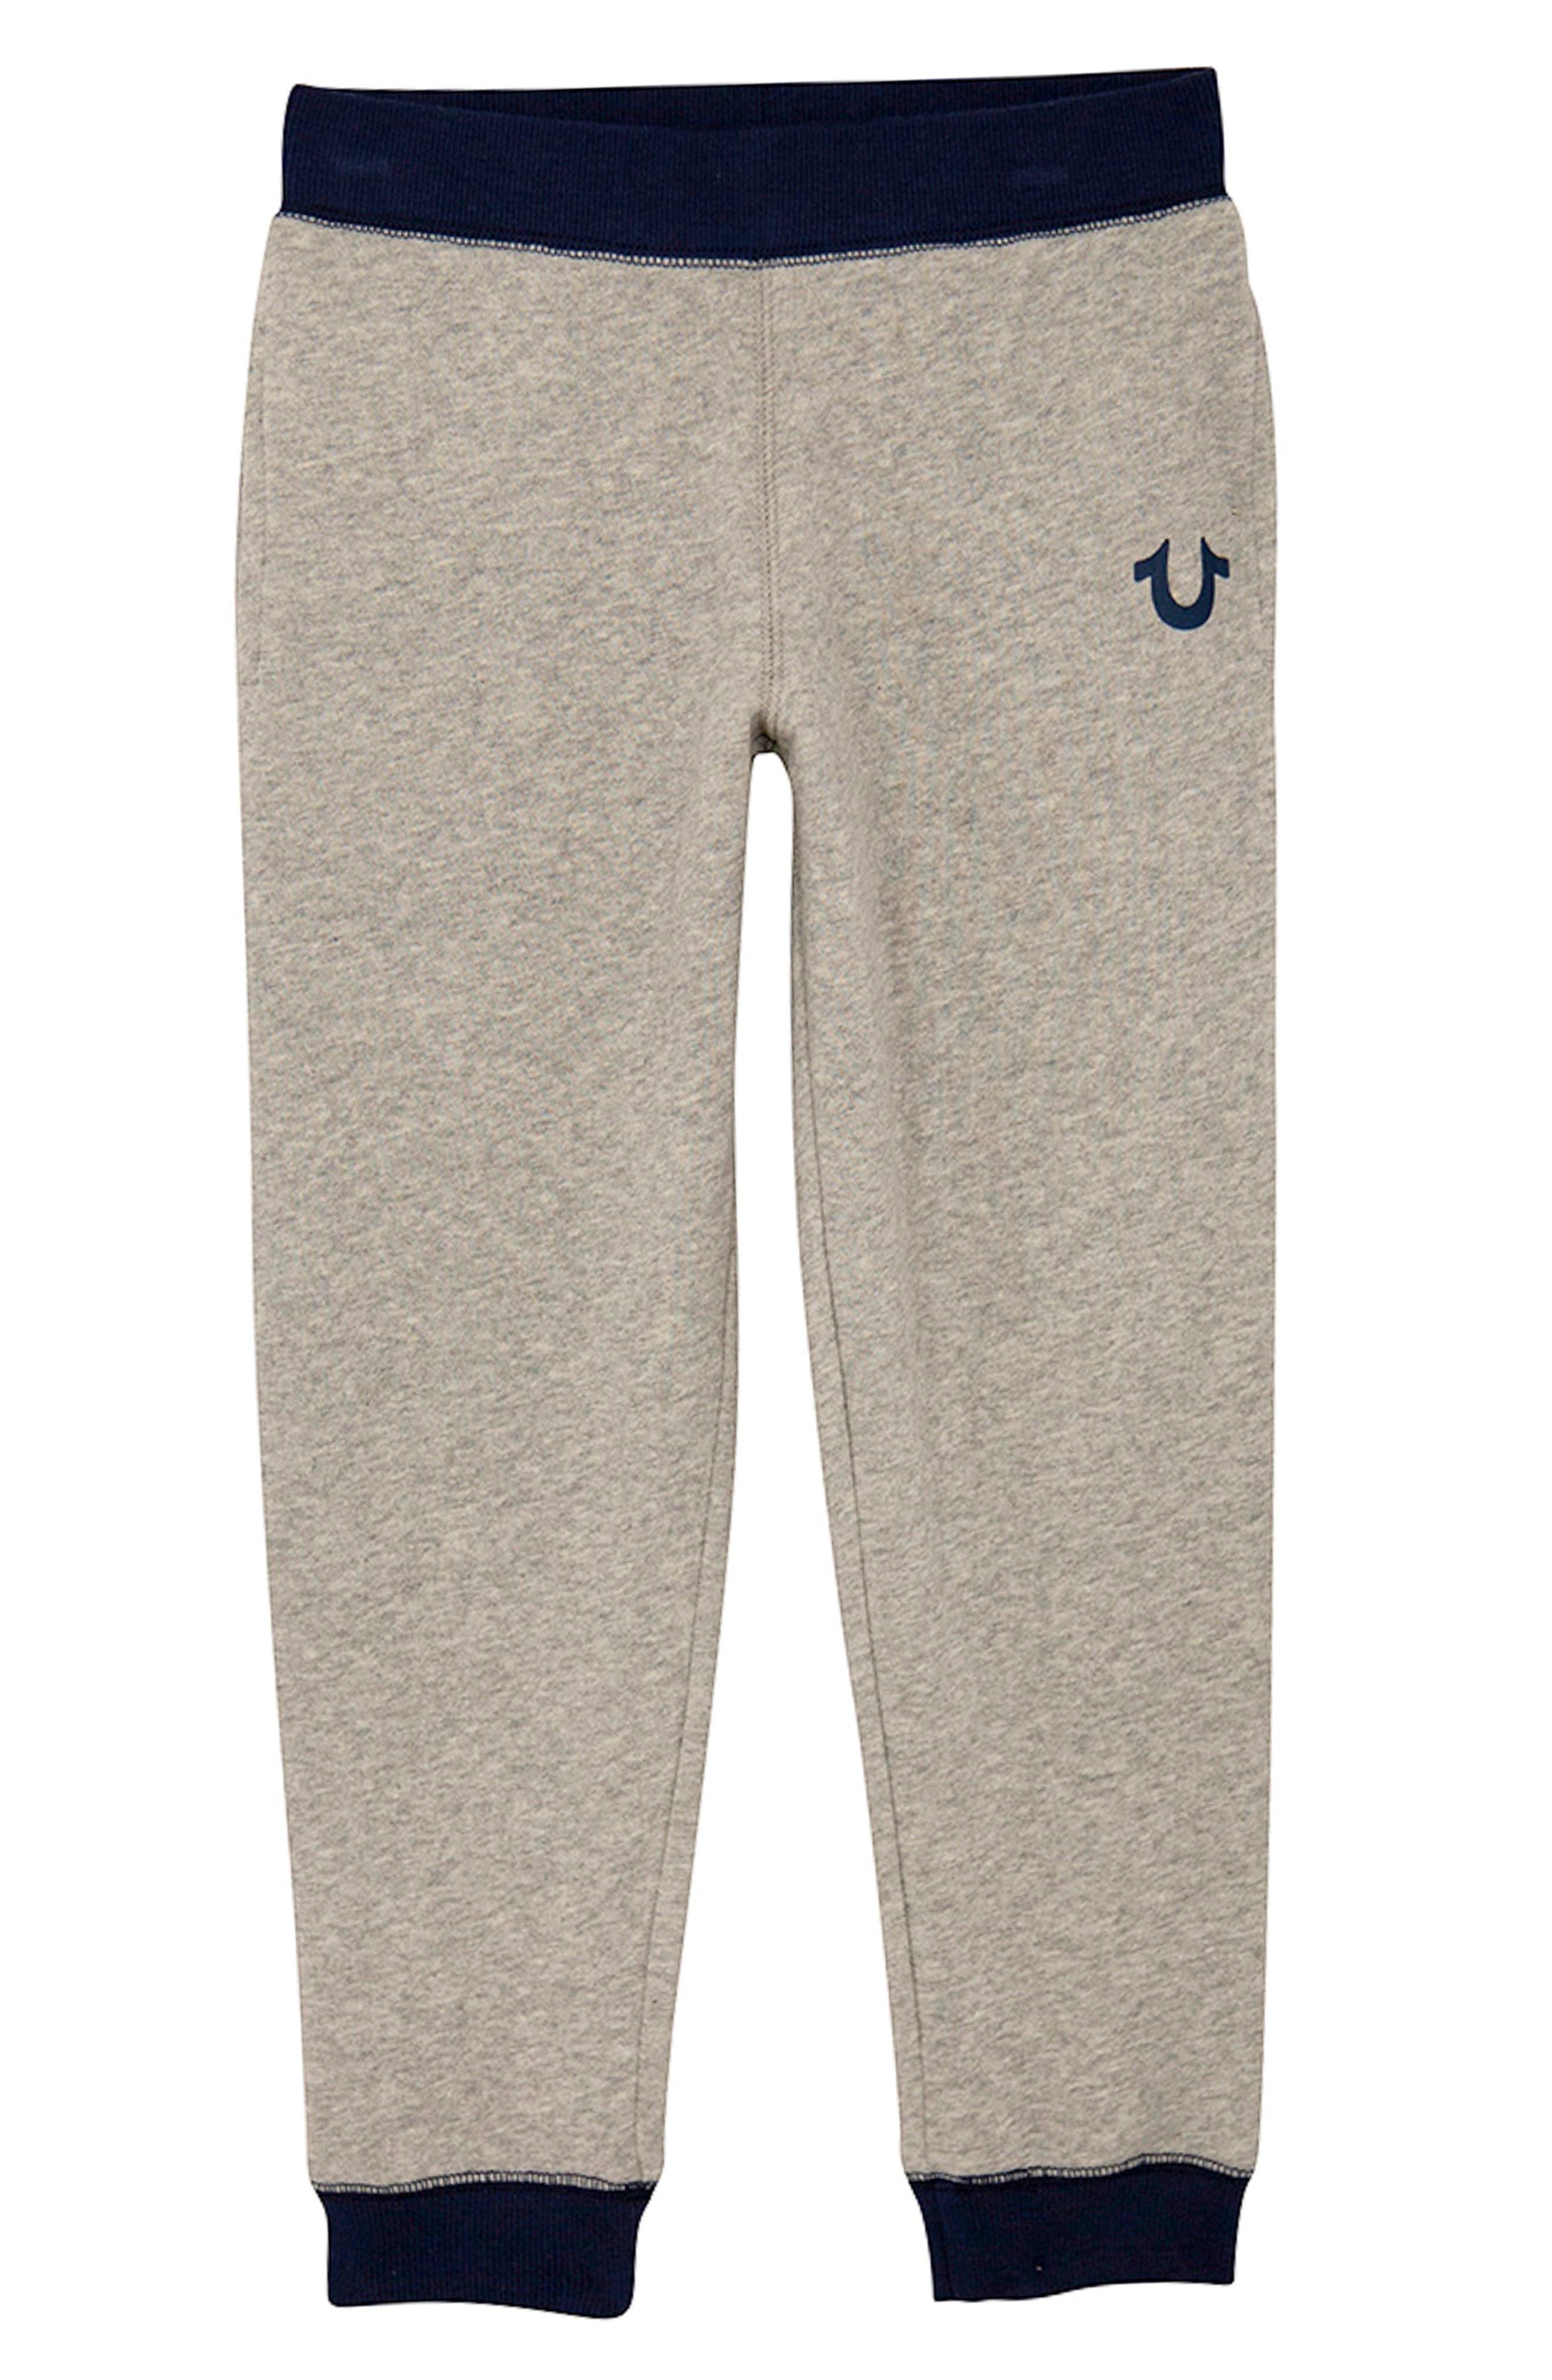 Boys True Religion Brand Jeans Jogger Pants